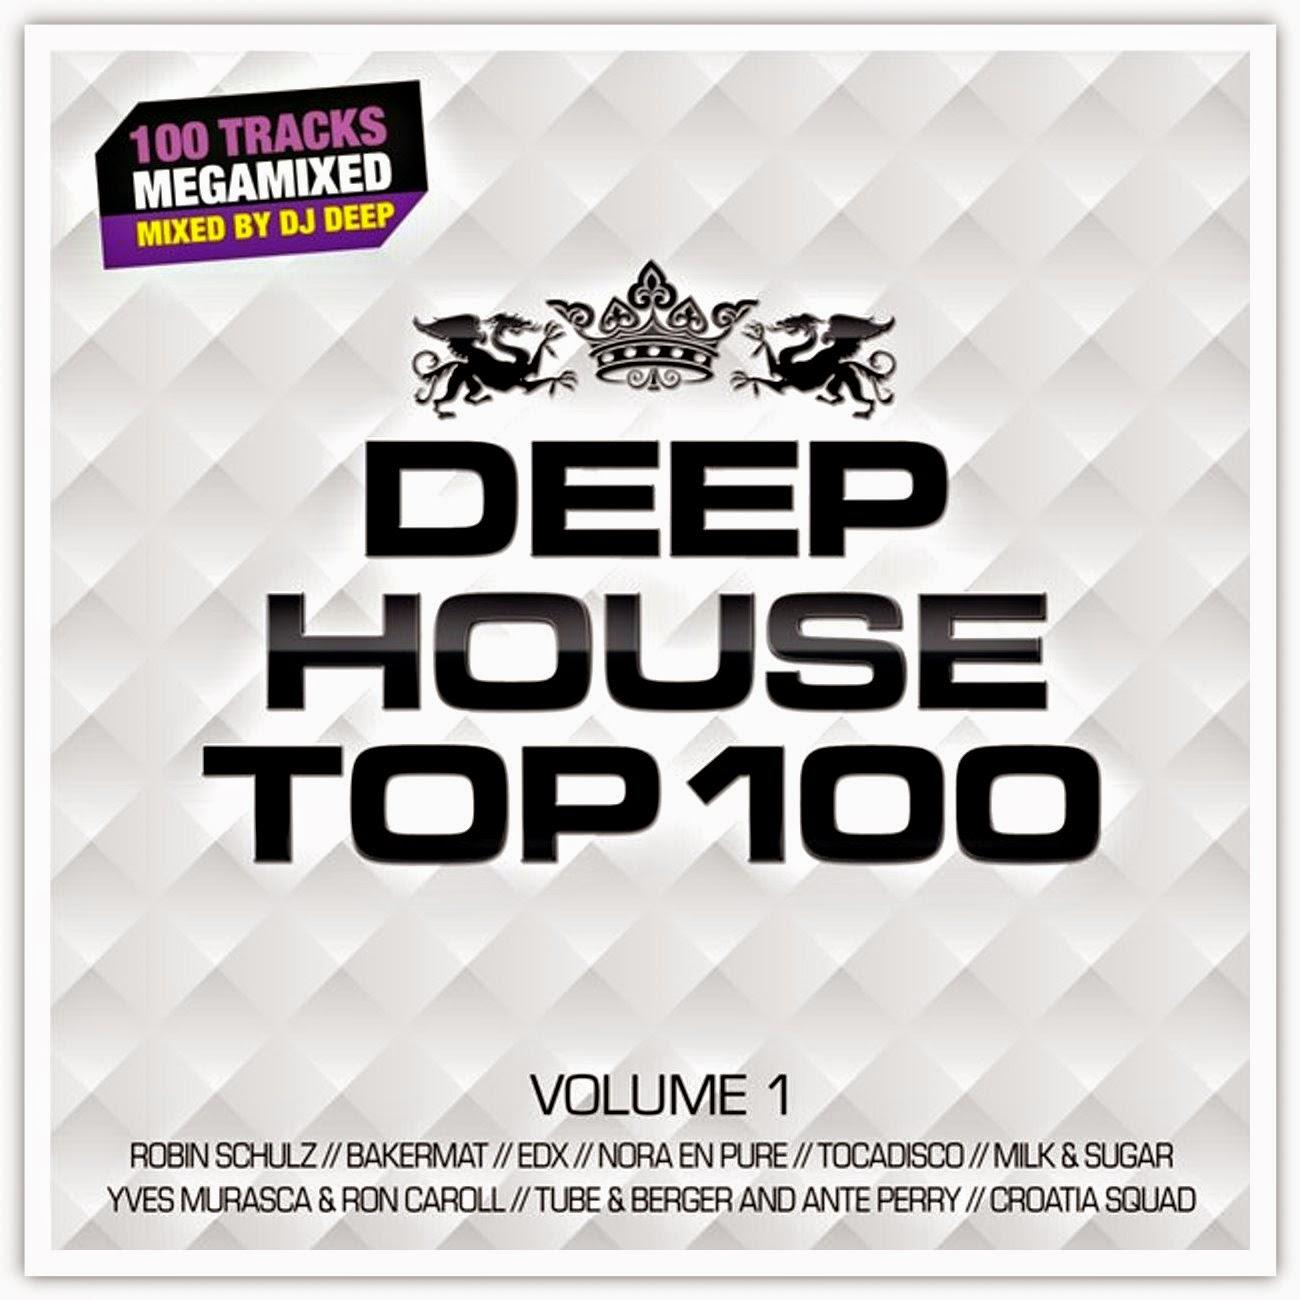 Adiamomusic deep house top 100 volume 1 for Deep house top